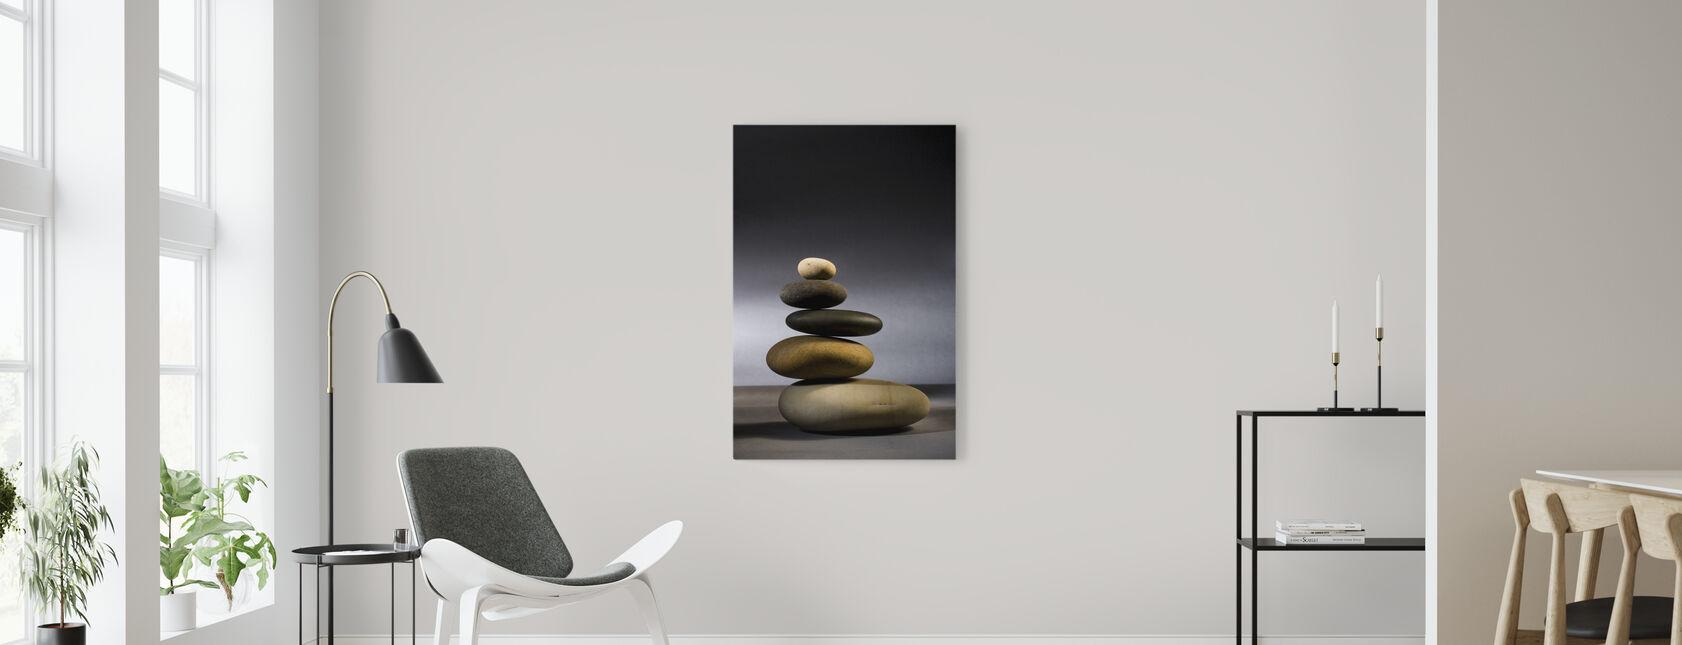 Steiner i Zen-balanse - Lerretsbilde - Stue